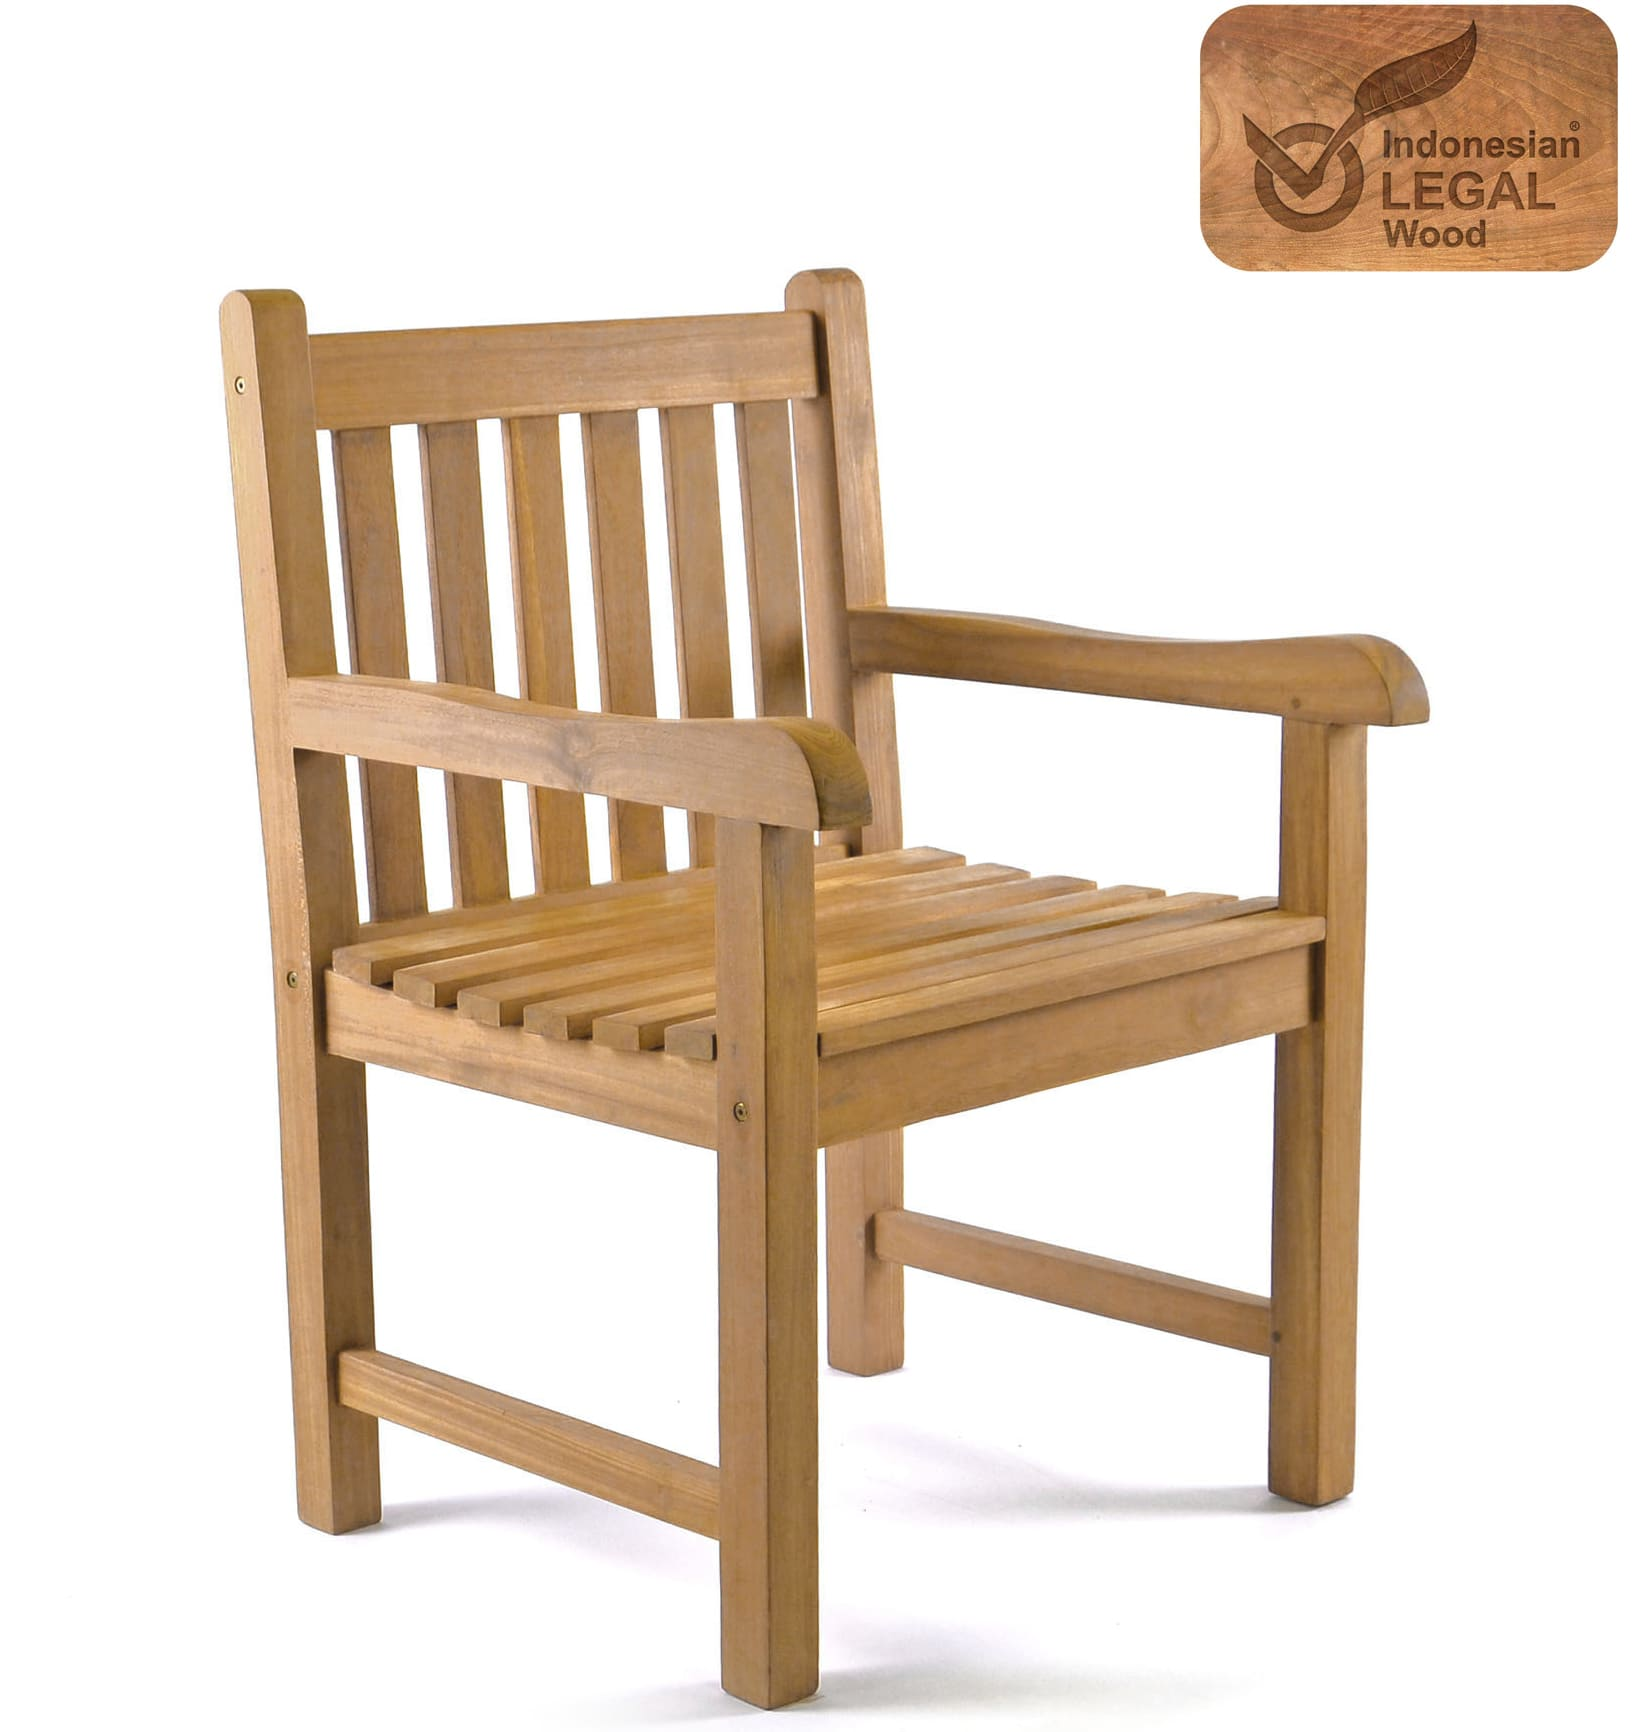 Golden Teak Wood Arm Chair Newbuy